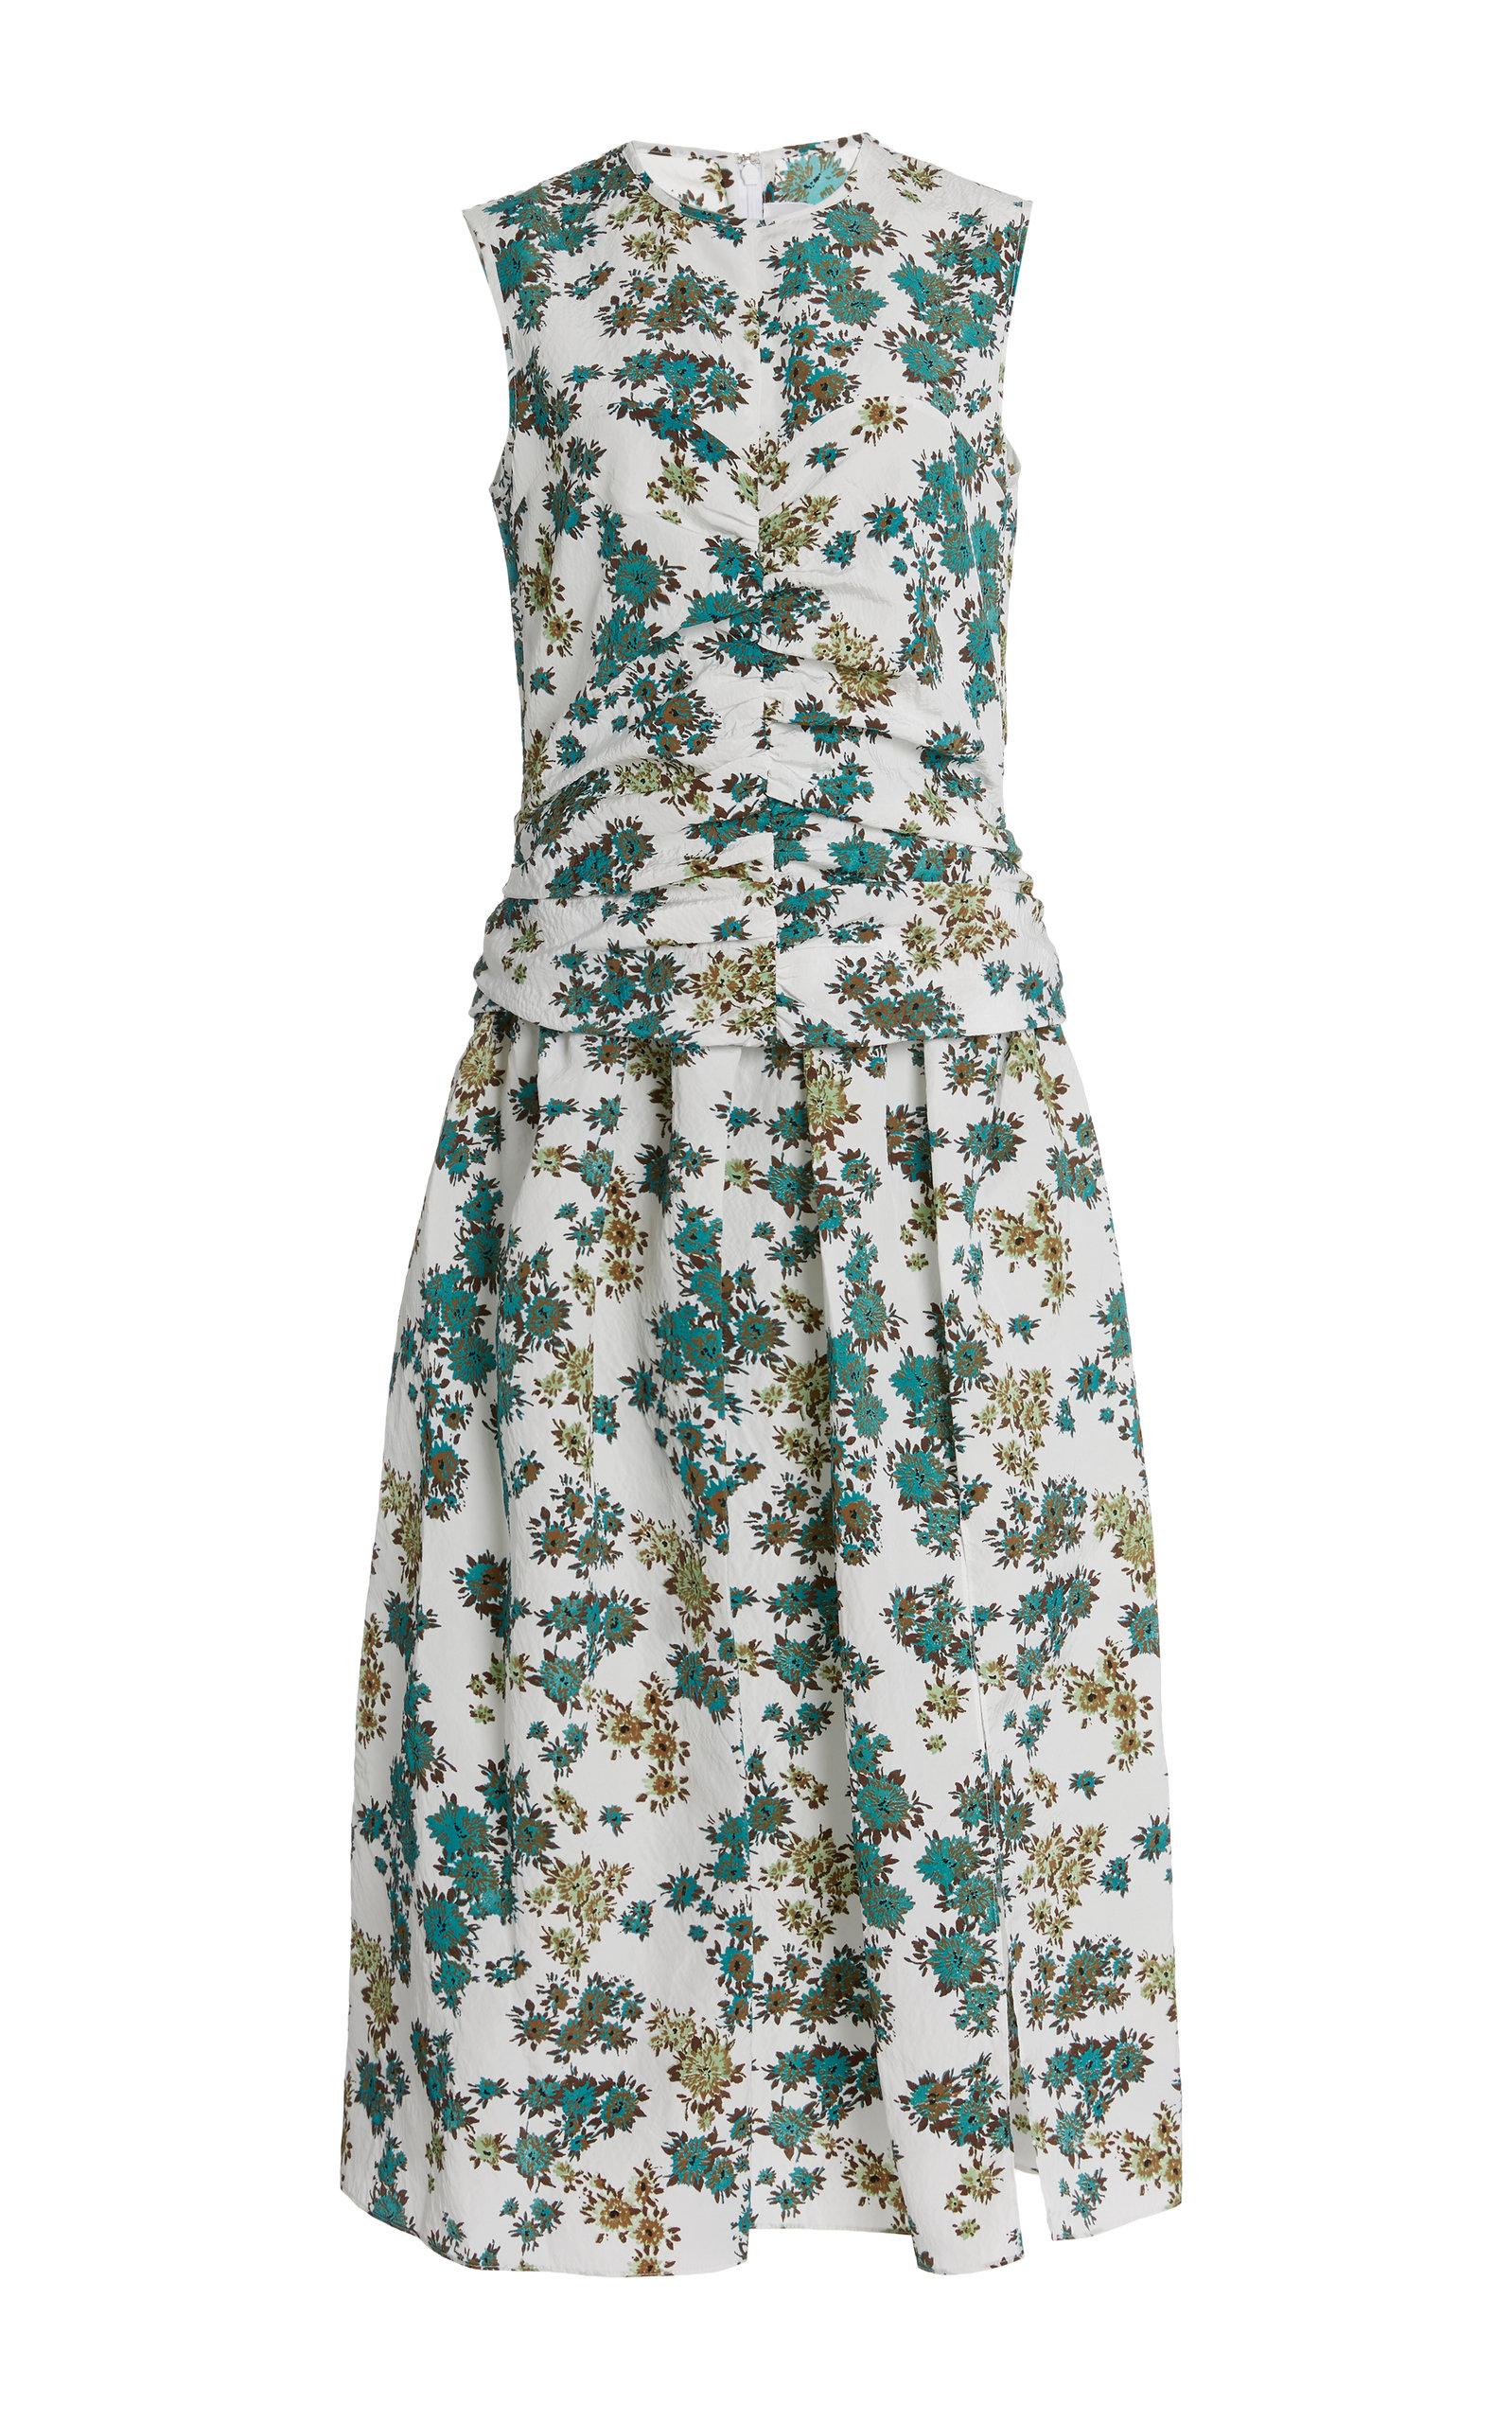 Buy Victoria Victoria Beckham Ruched Floral-Print Cloque Midi Dress online, shop Victoria Victoria Beckham at the best price